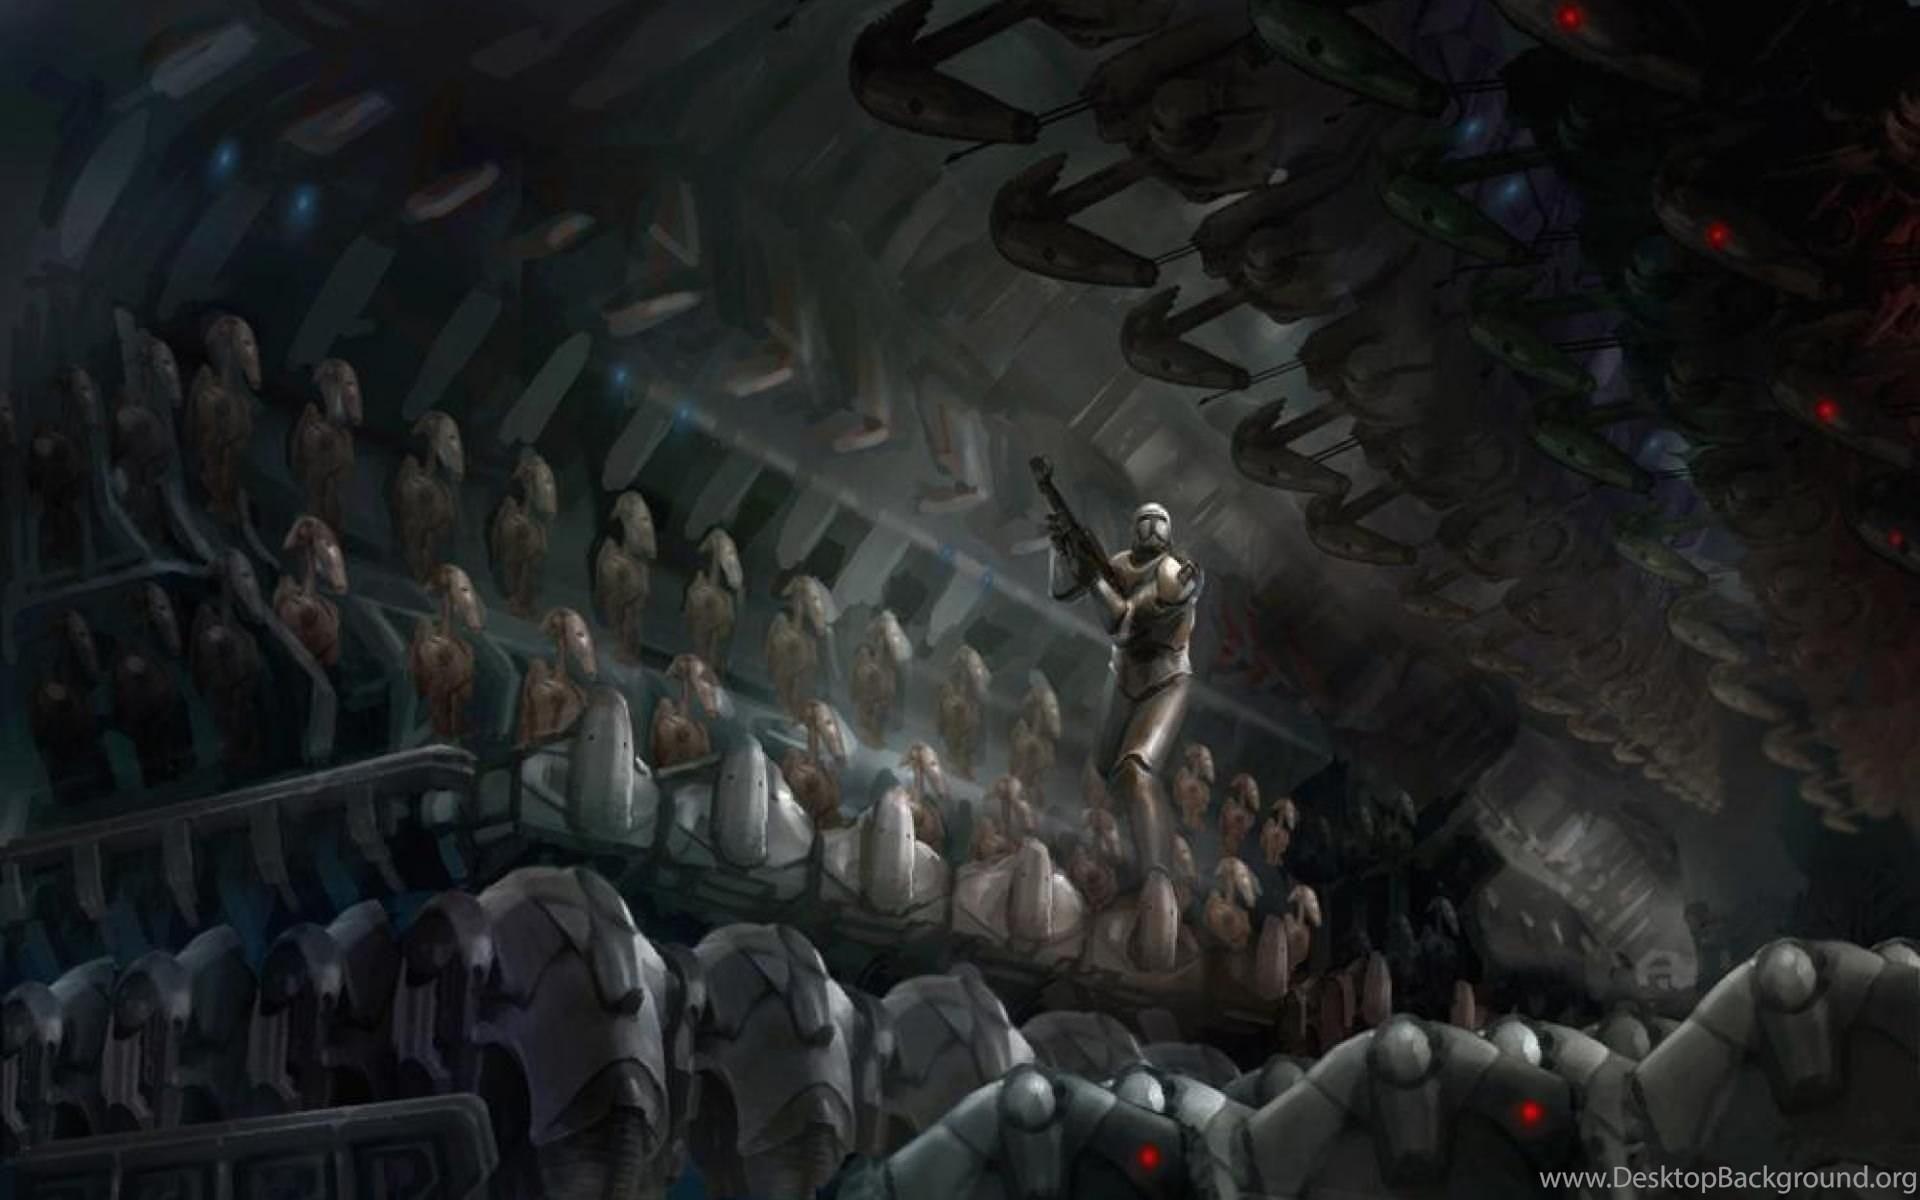 Star Wars Republic Commando Art Movies 1920x1200 Hd Wallpapers Desktop Background